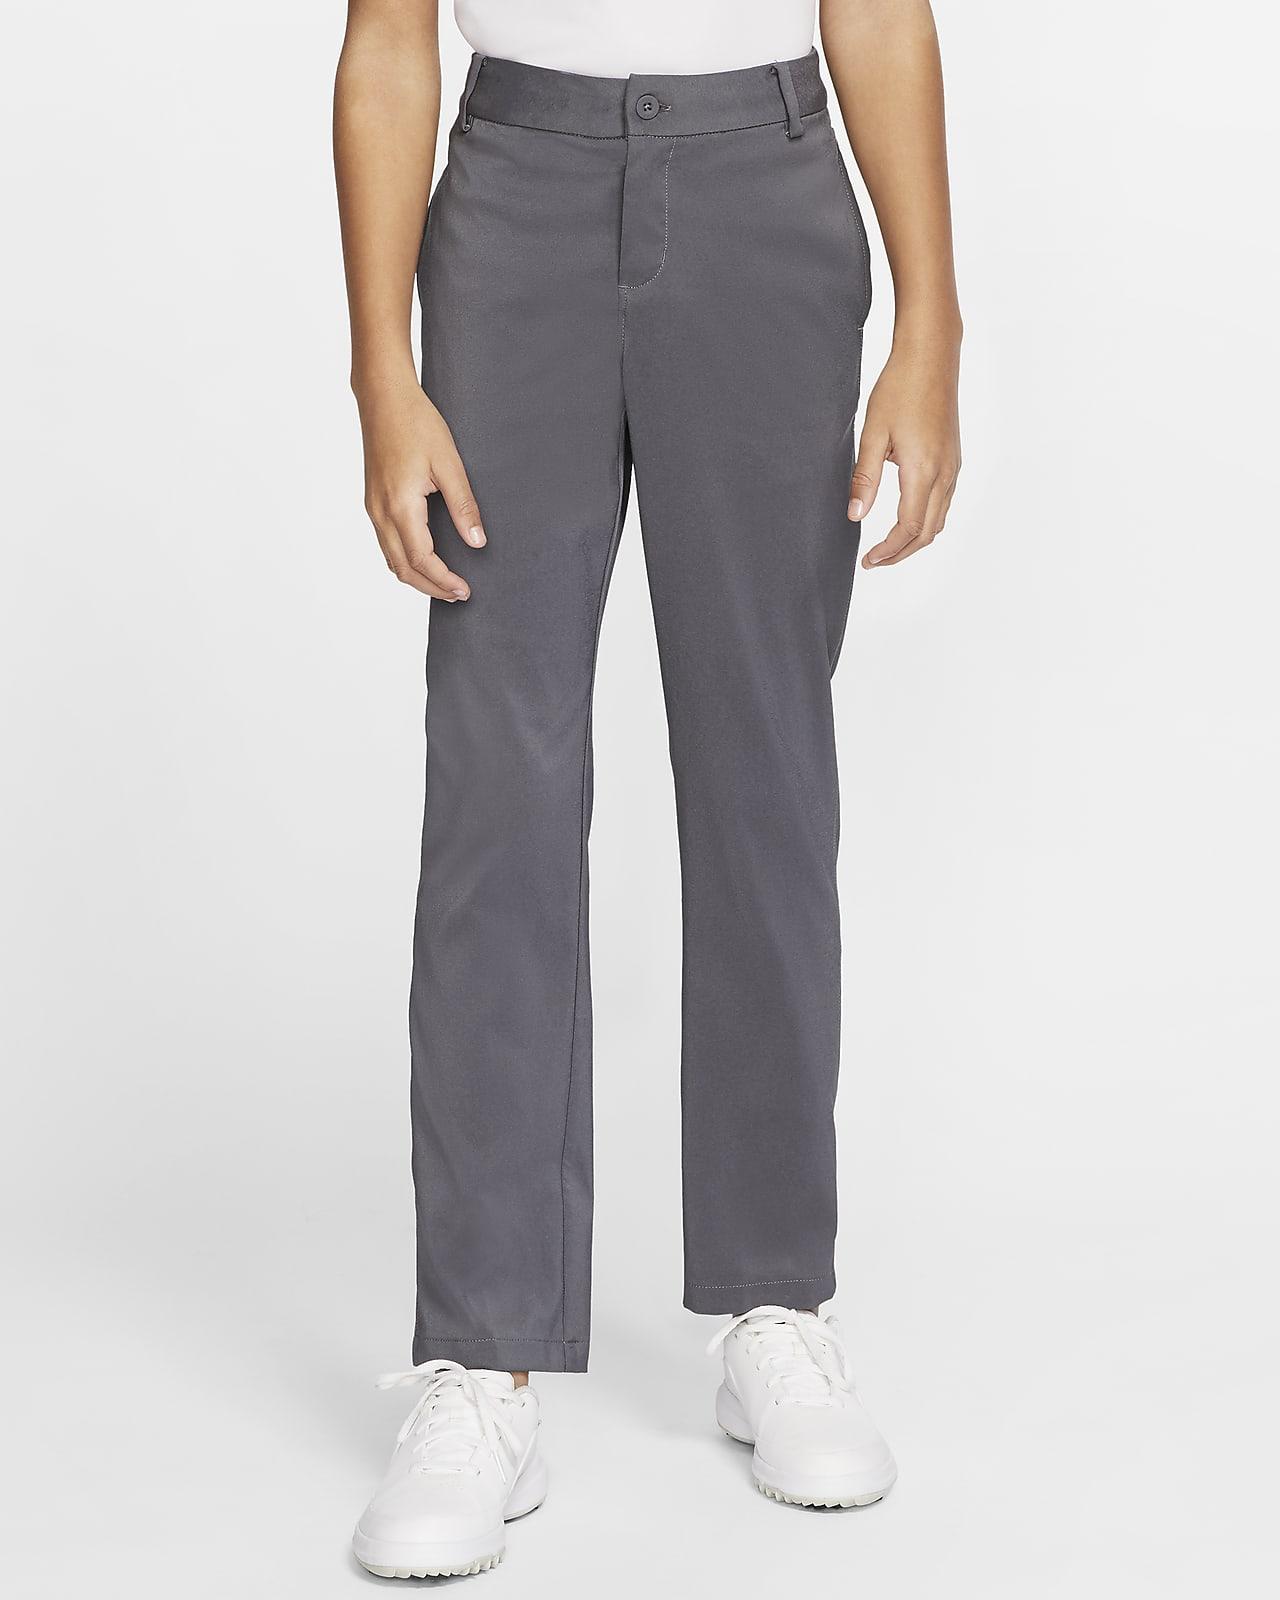 Pantalones de golf para niño talla grande Nike Flex